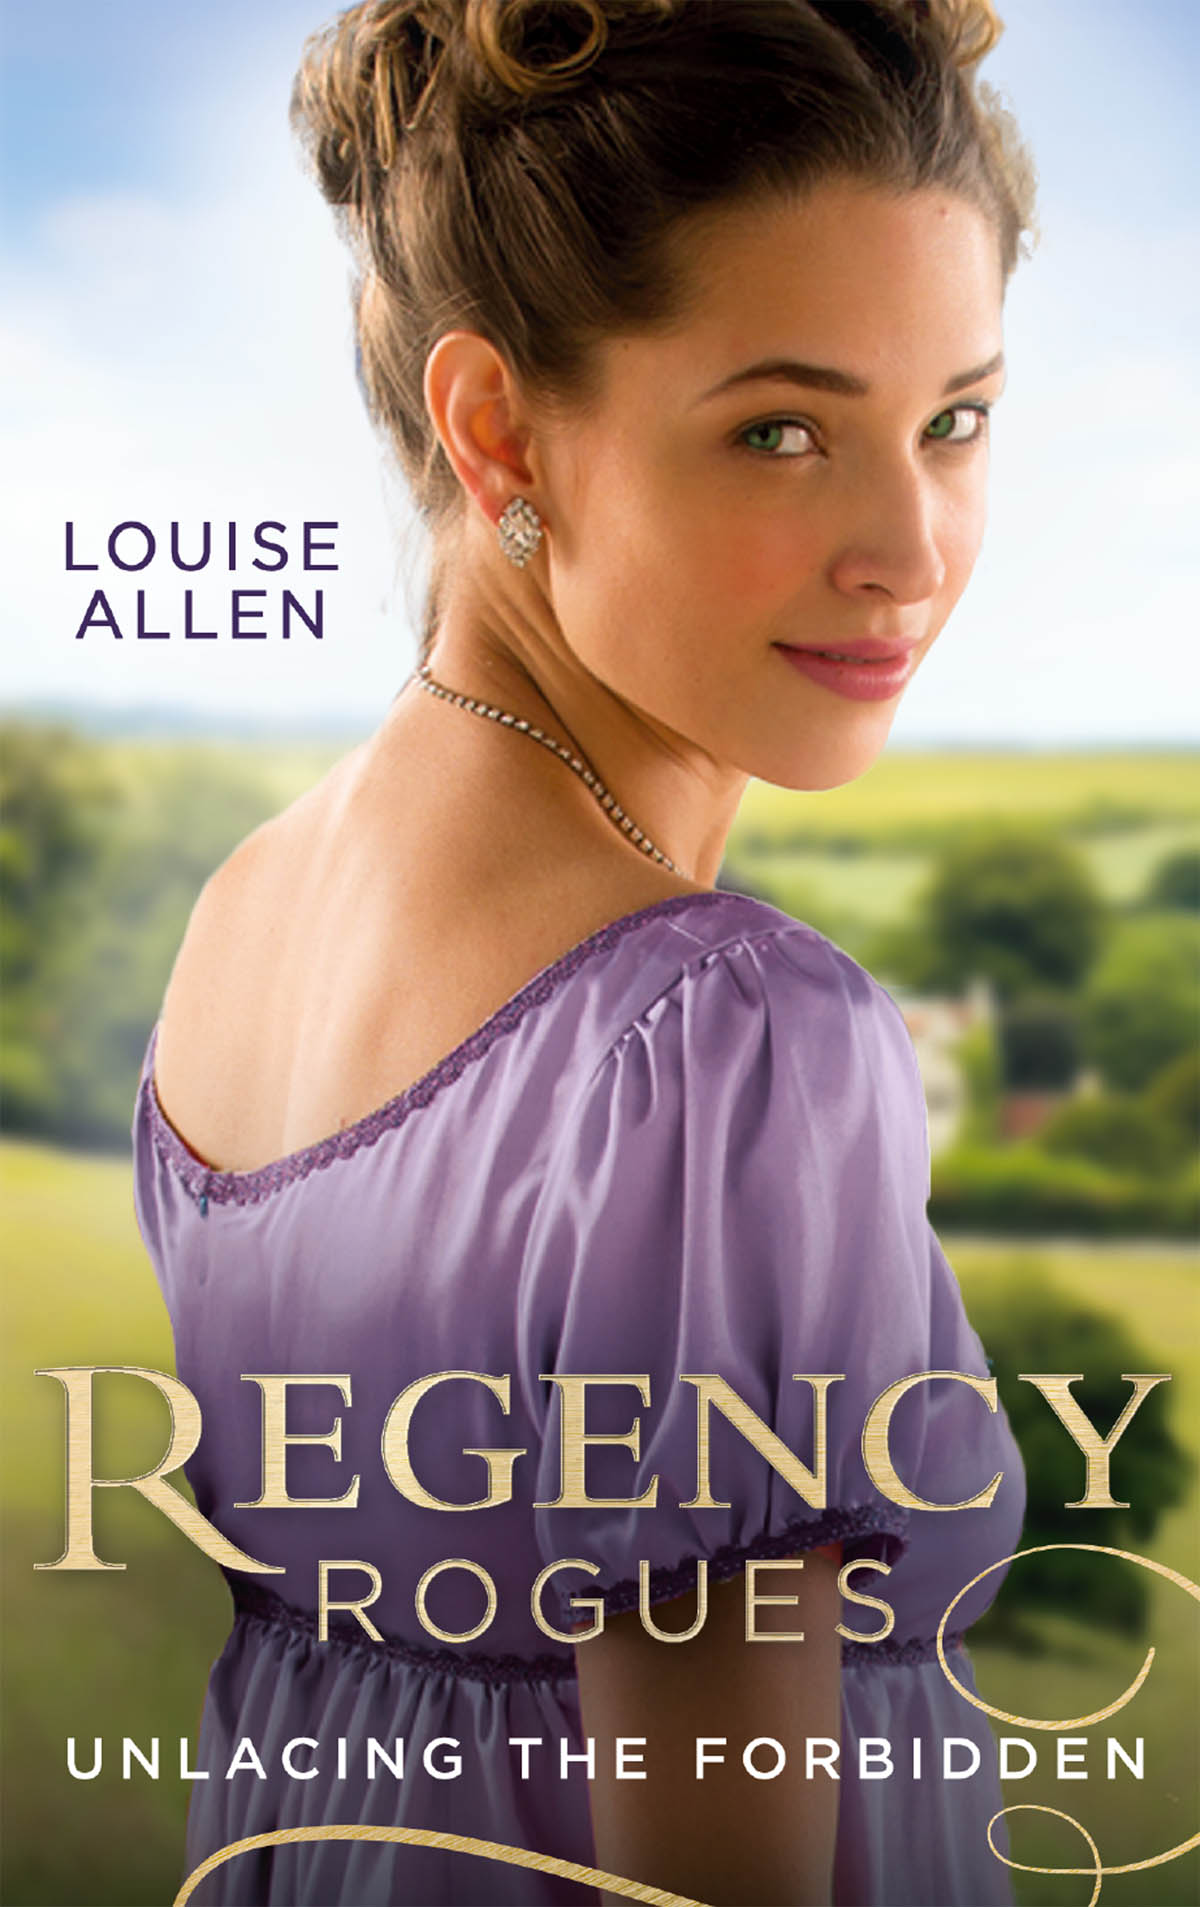 Louise Allen Regency Rogues: Unlacing The Forbidden: Unlacing Lady Thea / Forbidden Jewel of India все цены